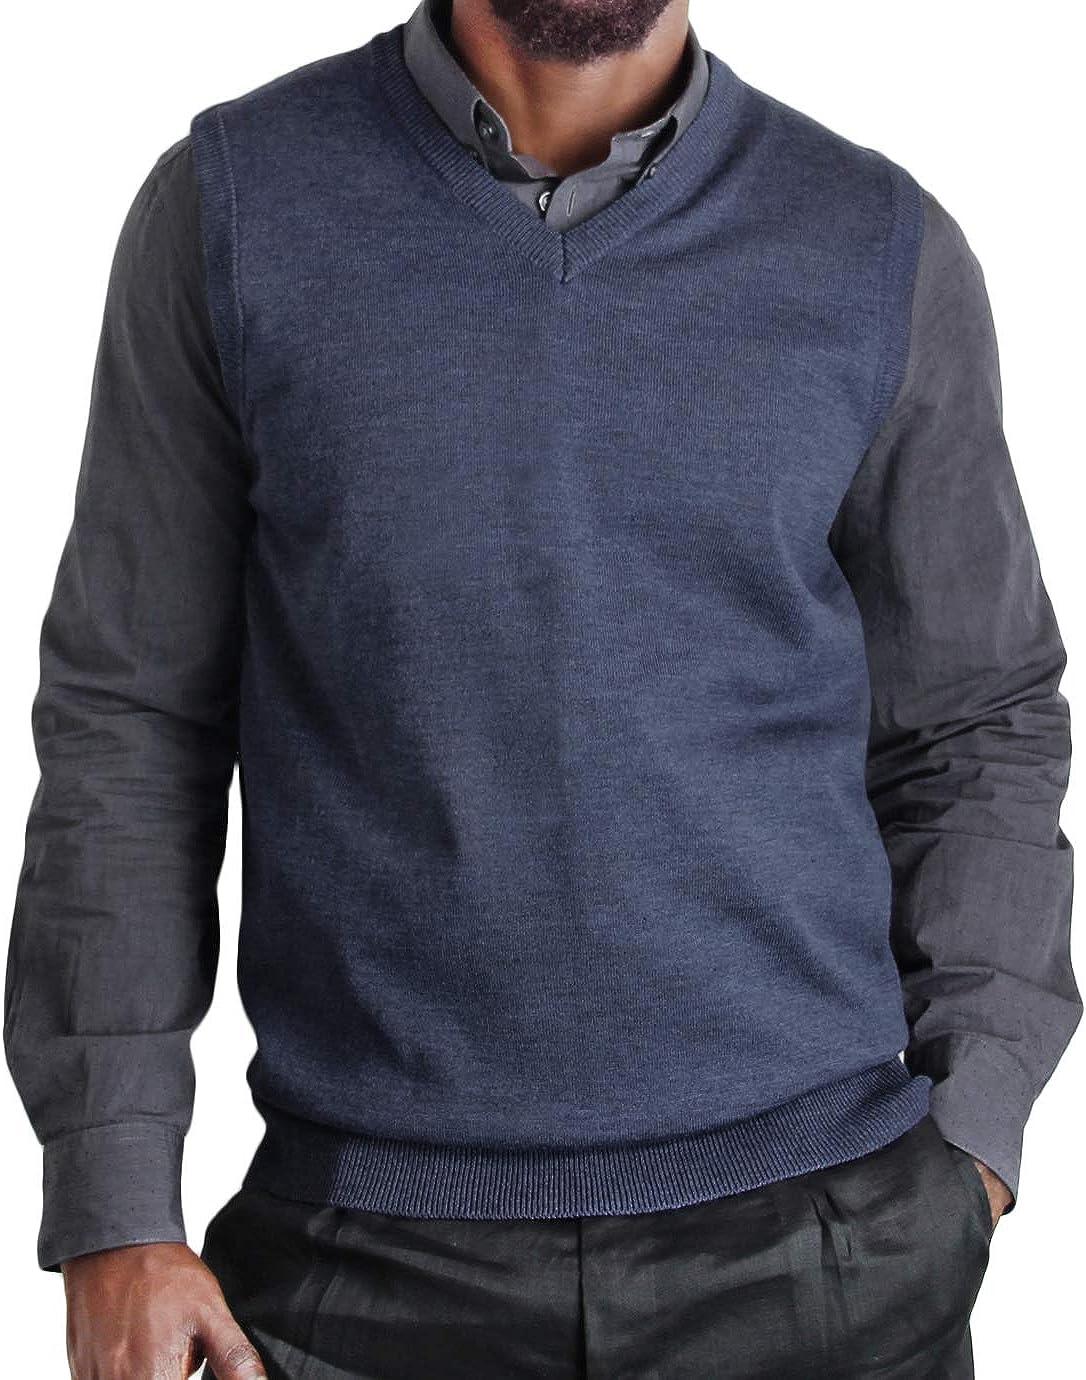 Blue Ocean Big Men Heather Sweater Vest-4X-Large